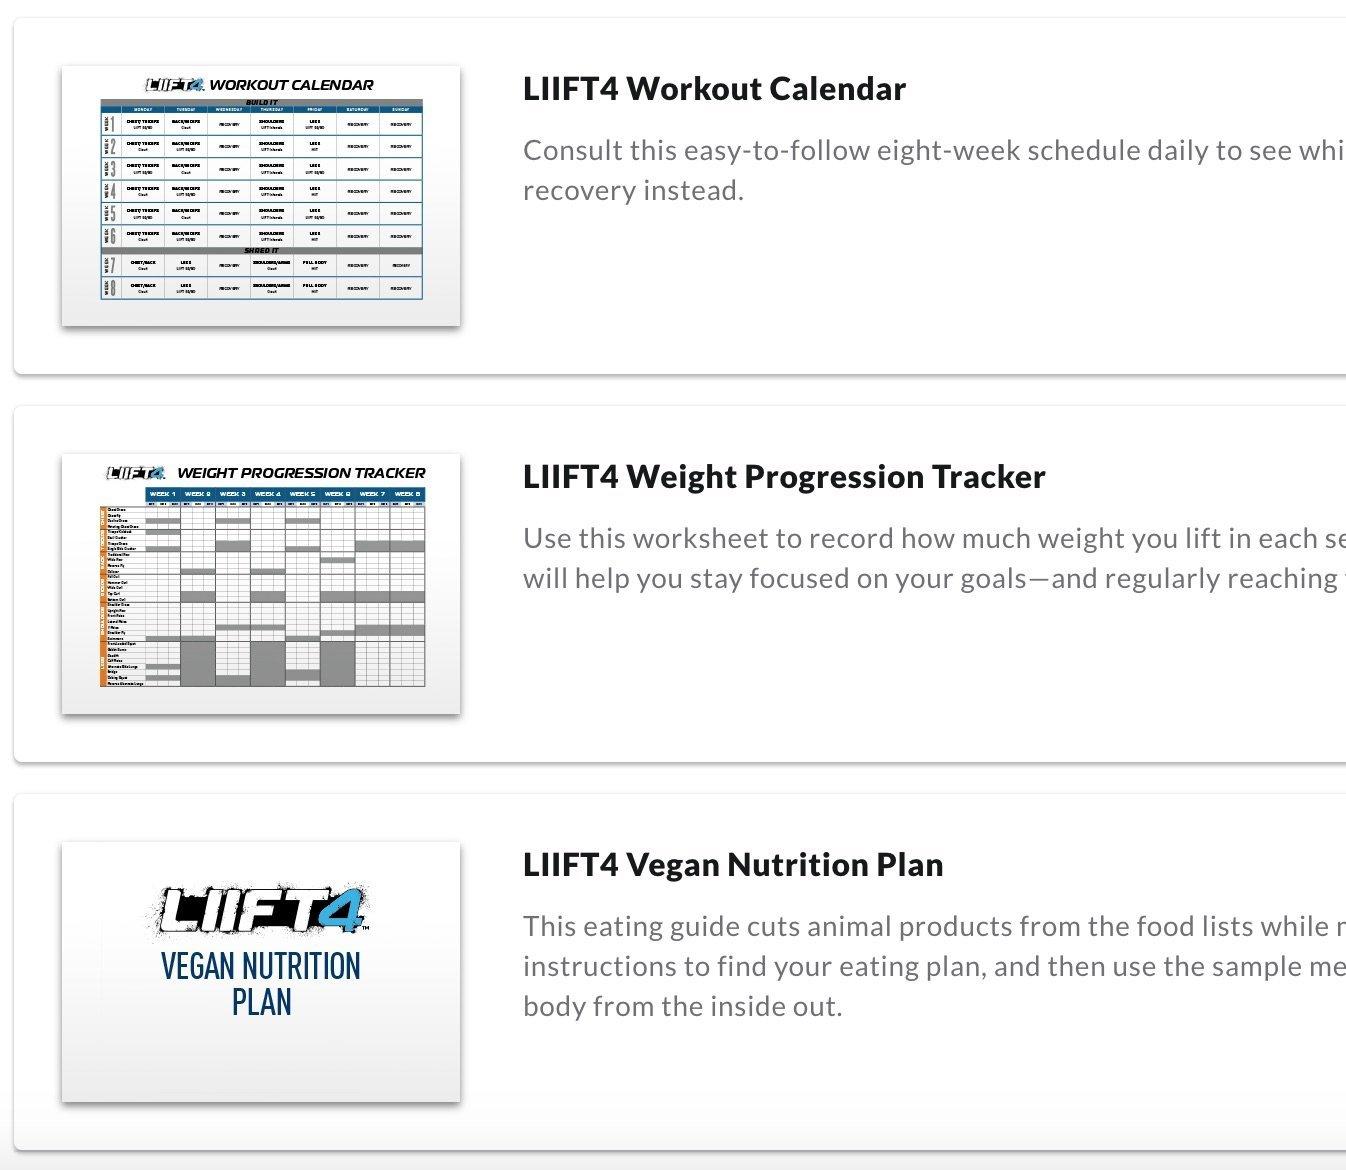 beachbody on demand free trial nutrition plan, weight tracker, program calendar